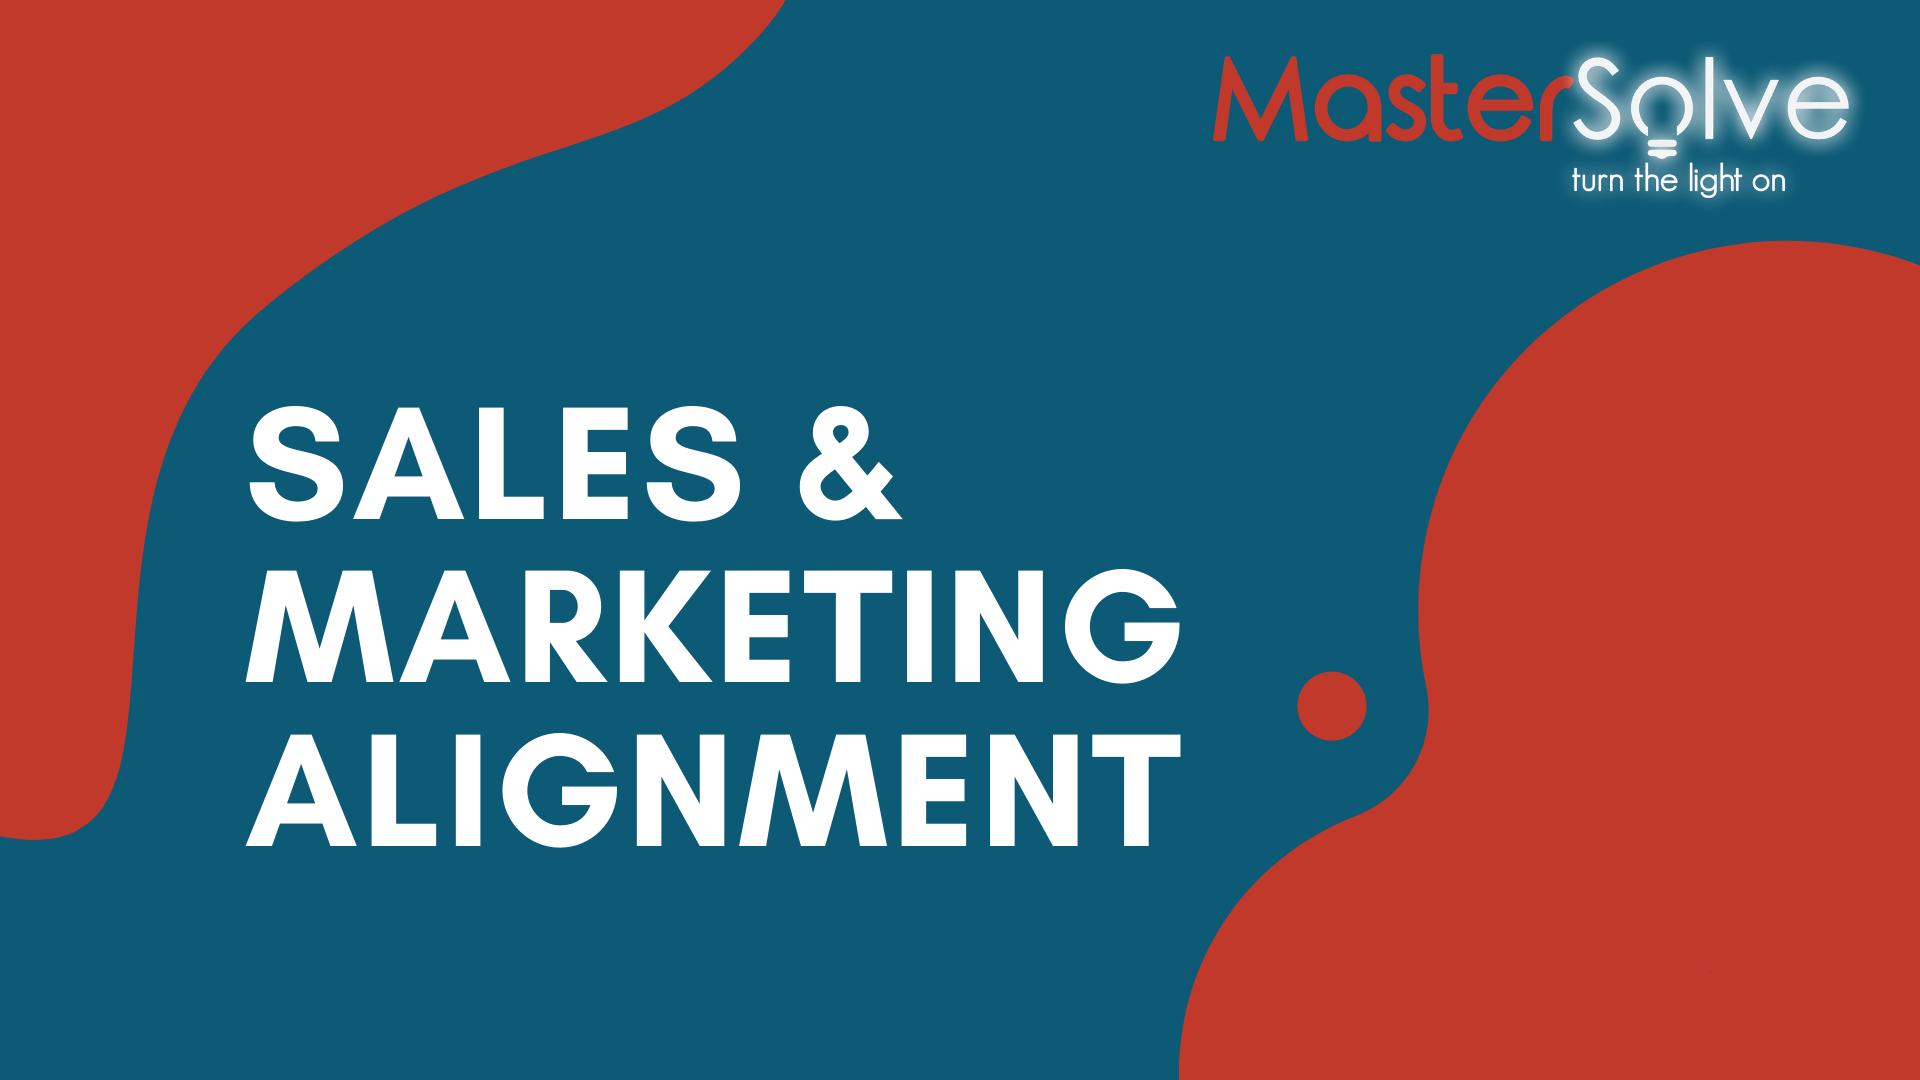 Sales & Marketing Alignment